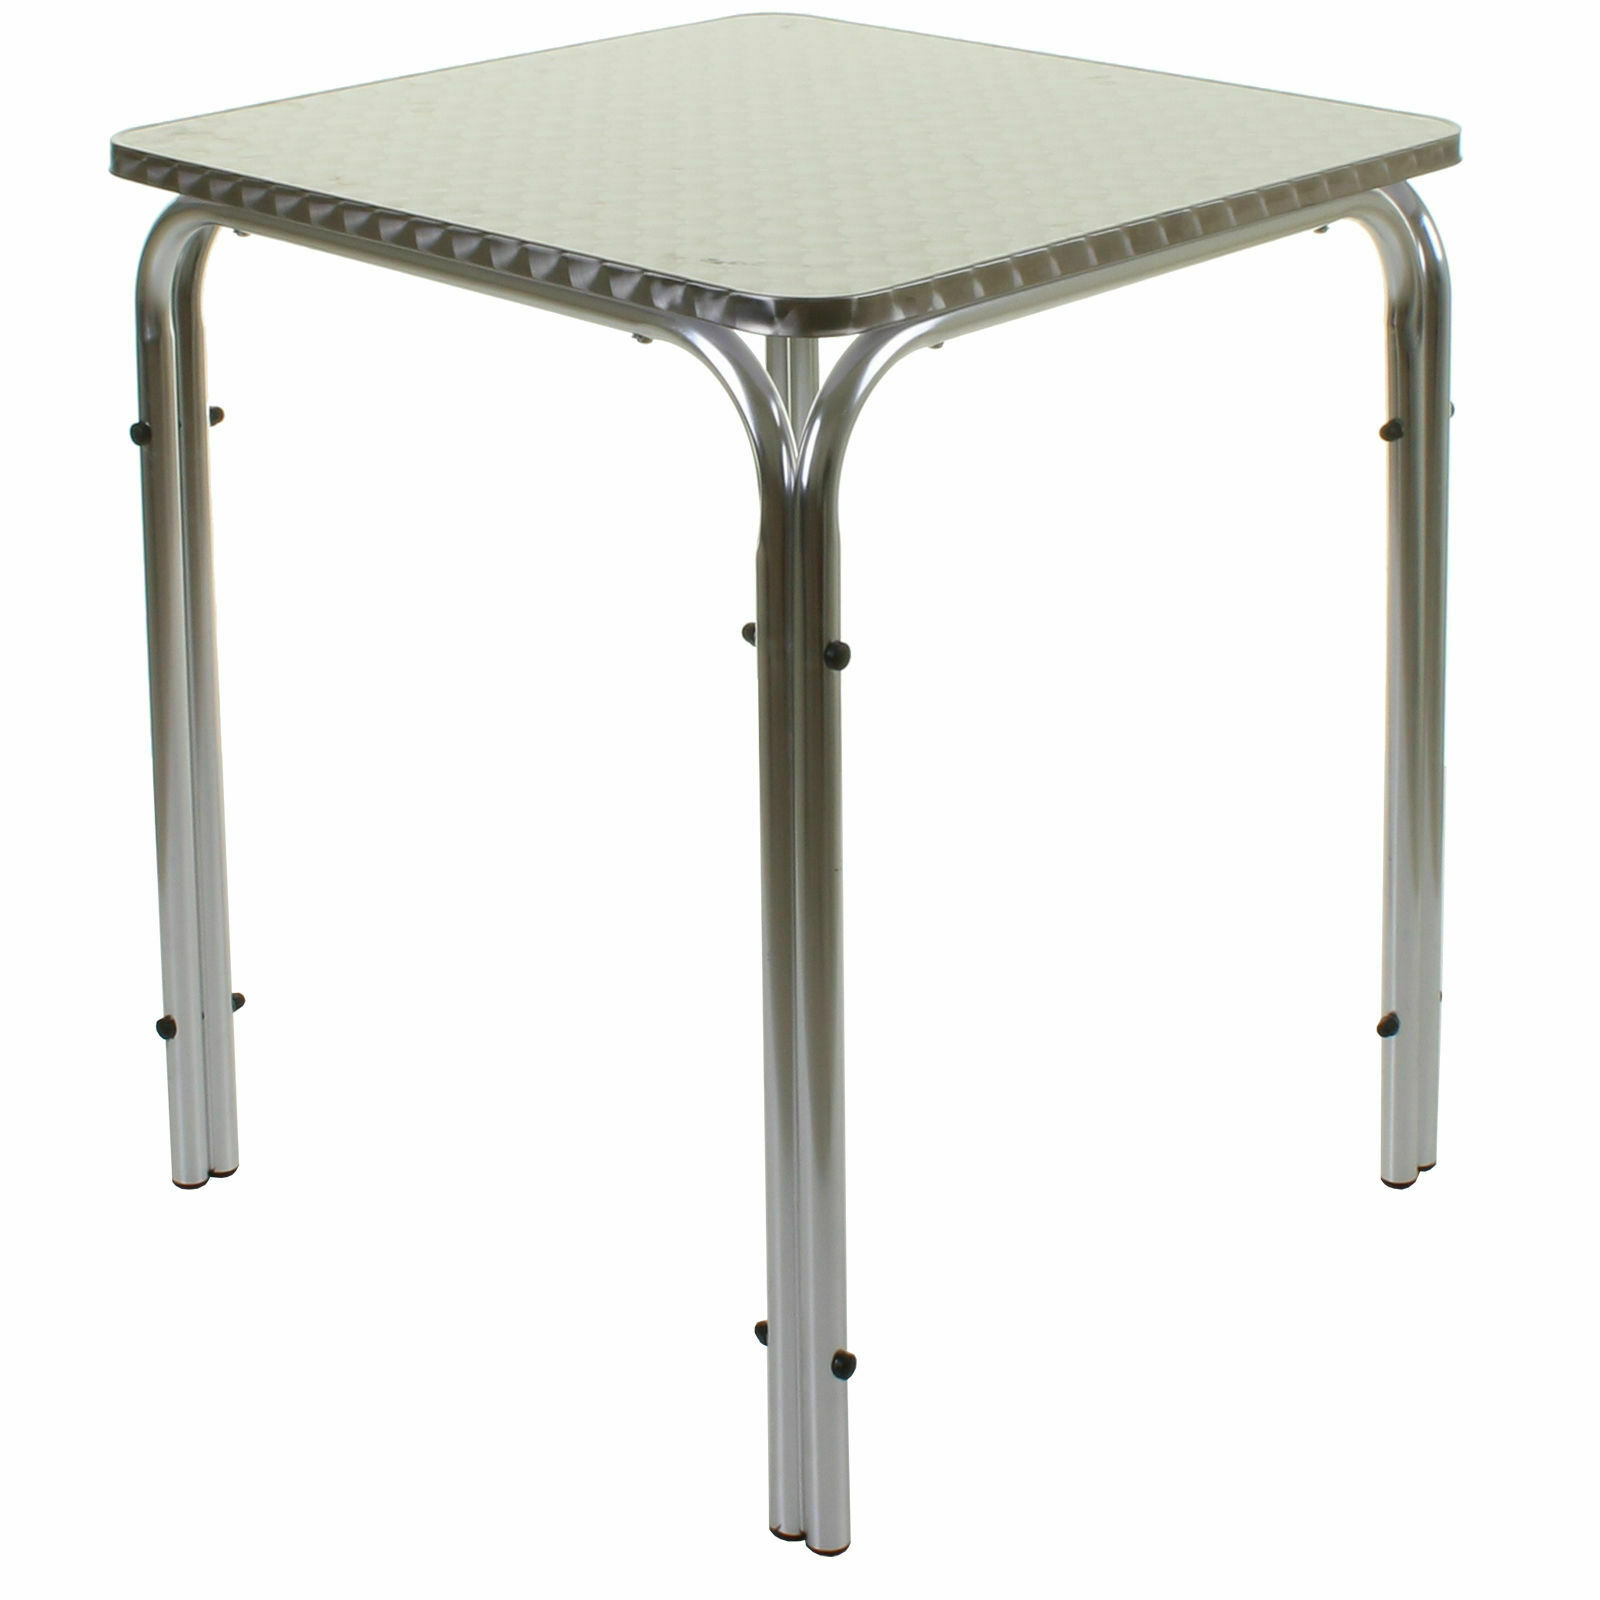 5PC Bistro Set Aluminium Lightweight Chrome Outdoor Garden Patio Furniture Metal